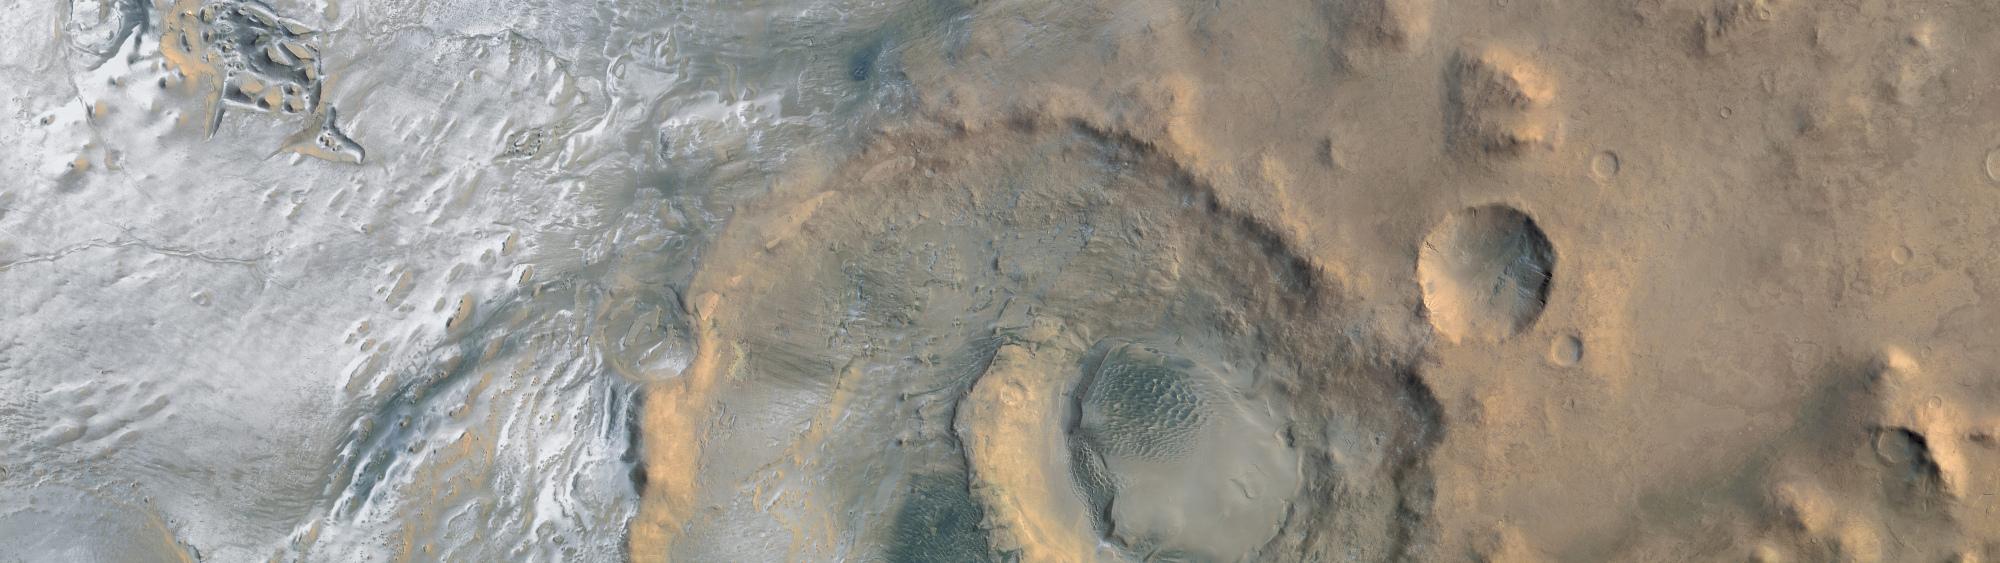 hooke-crater-cowart.thumb.jpg.1e0a7473e837b7063bcc71c14f48e688.jpg